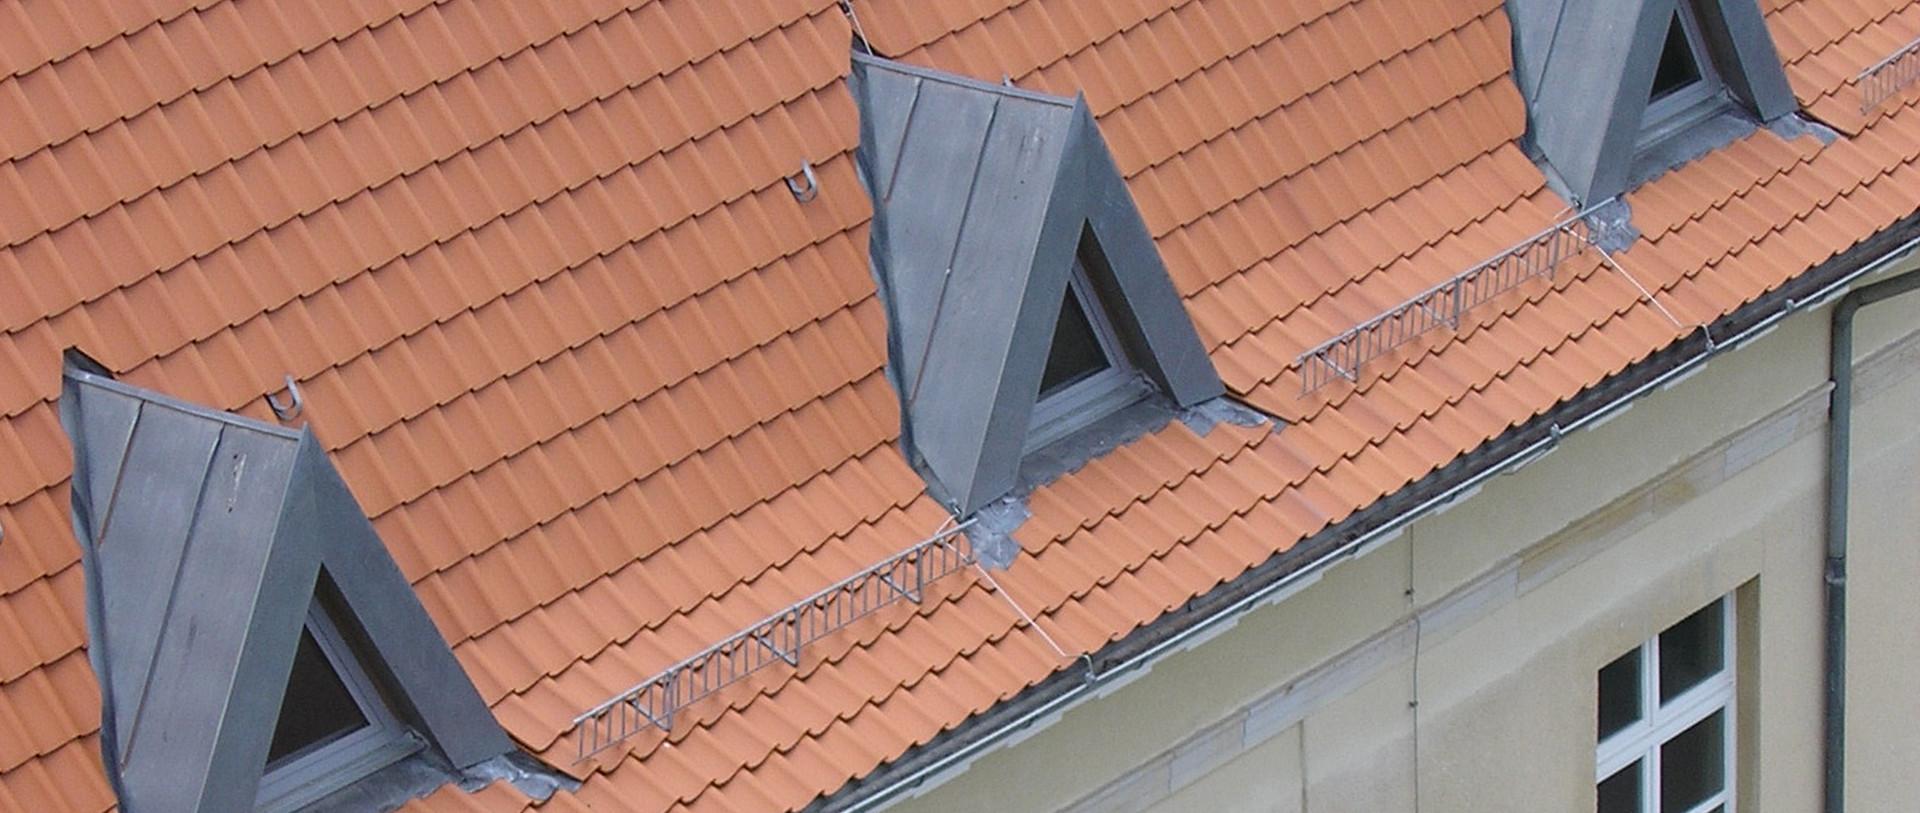 Dachausbau Altbau mit Dreiecksdachgauben